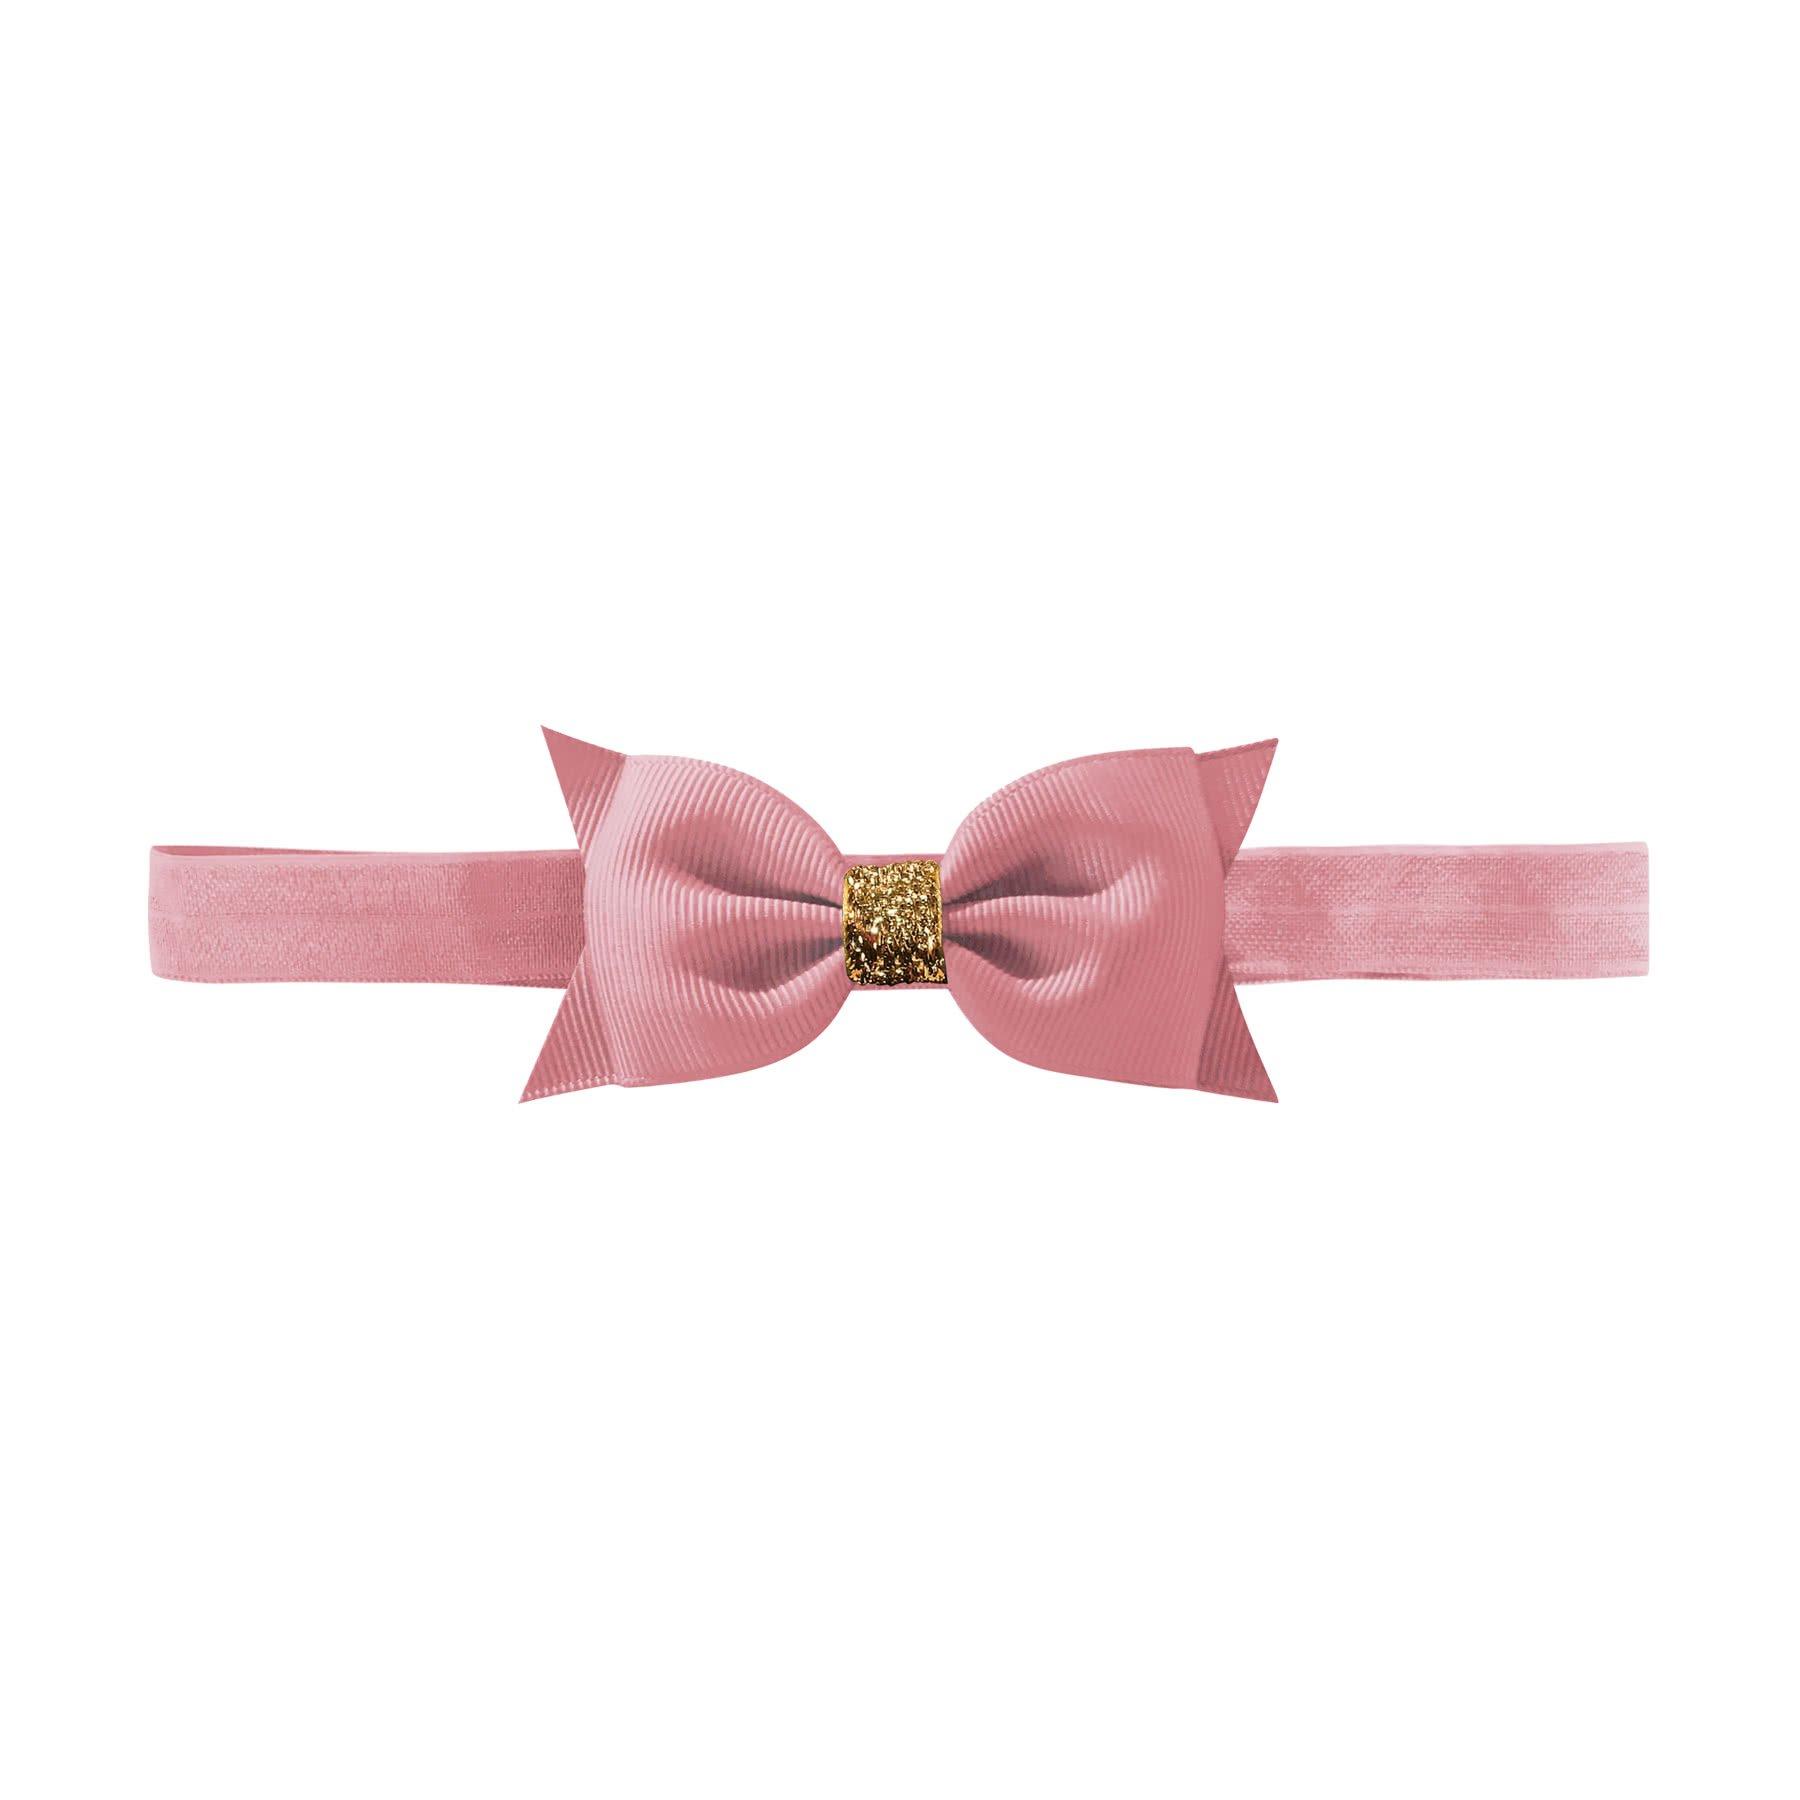 Milledeux Double Bowtie Bow Elastic Hairband Wild Rose Gold Glitter Milledeux